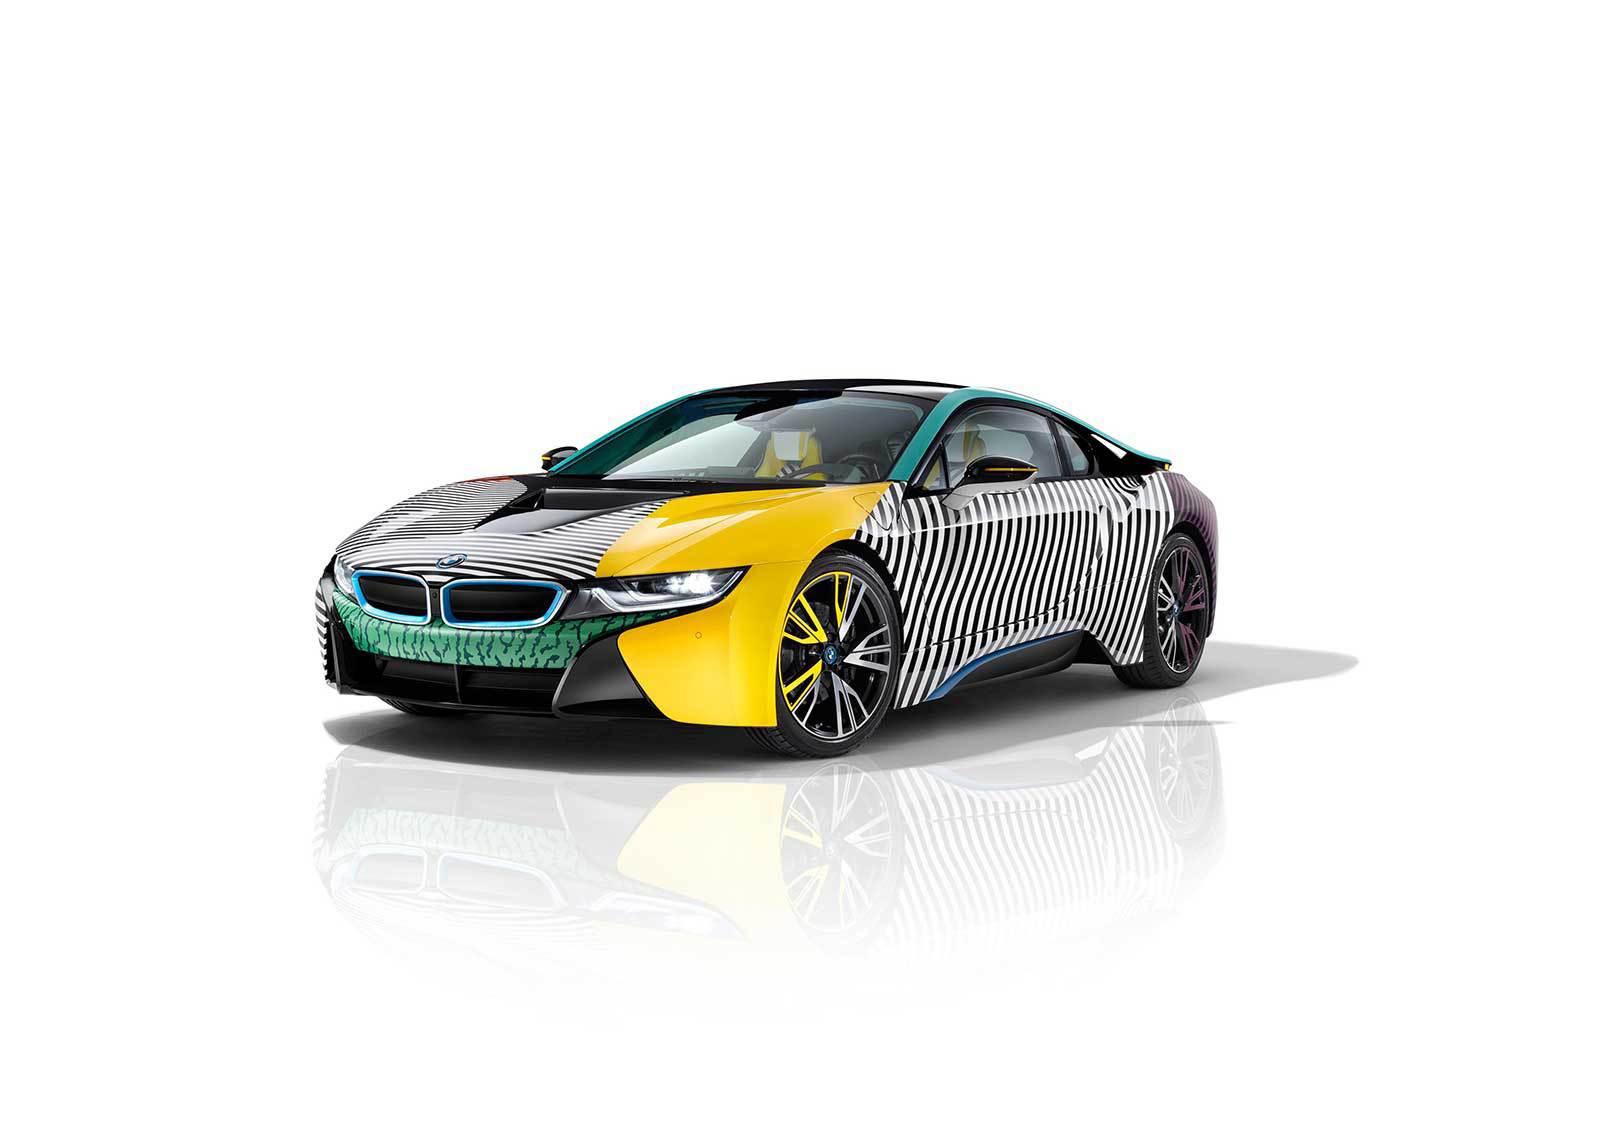 BMW i8 MemphisStyle Concept - Garage Italia Customs